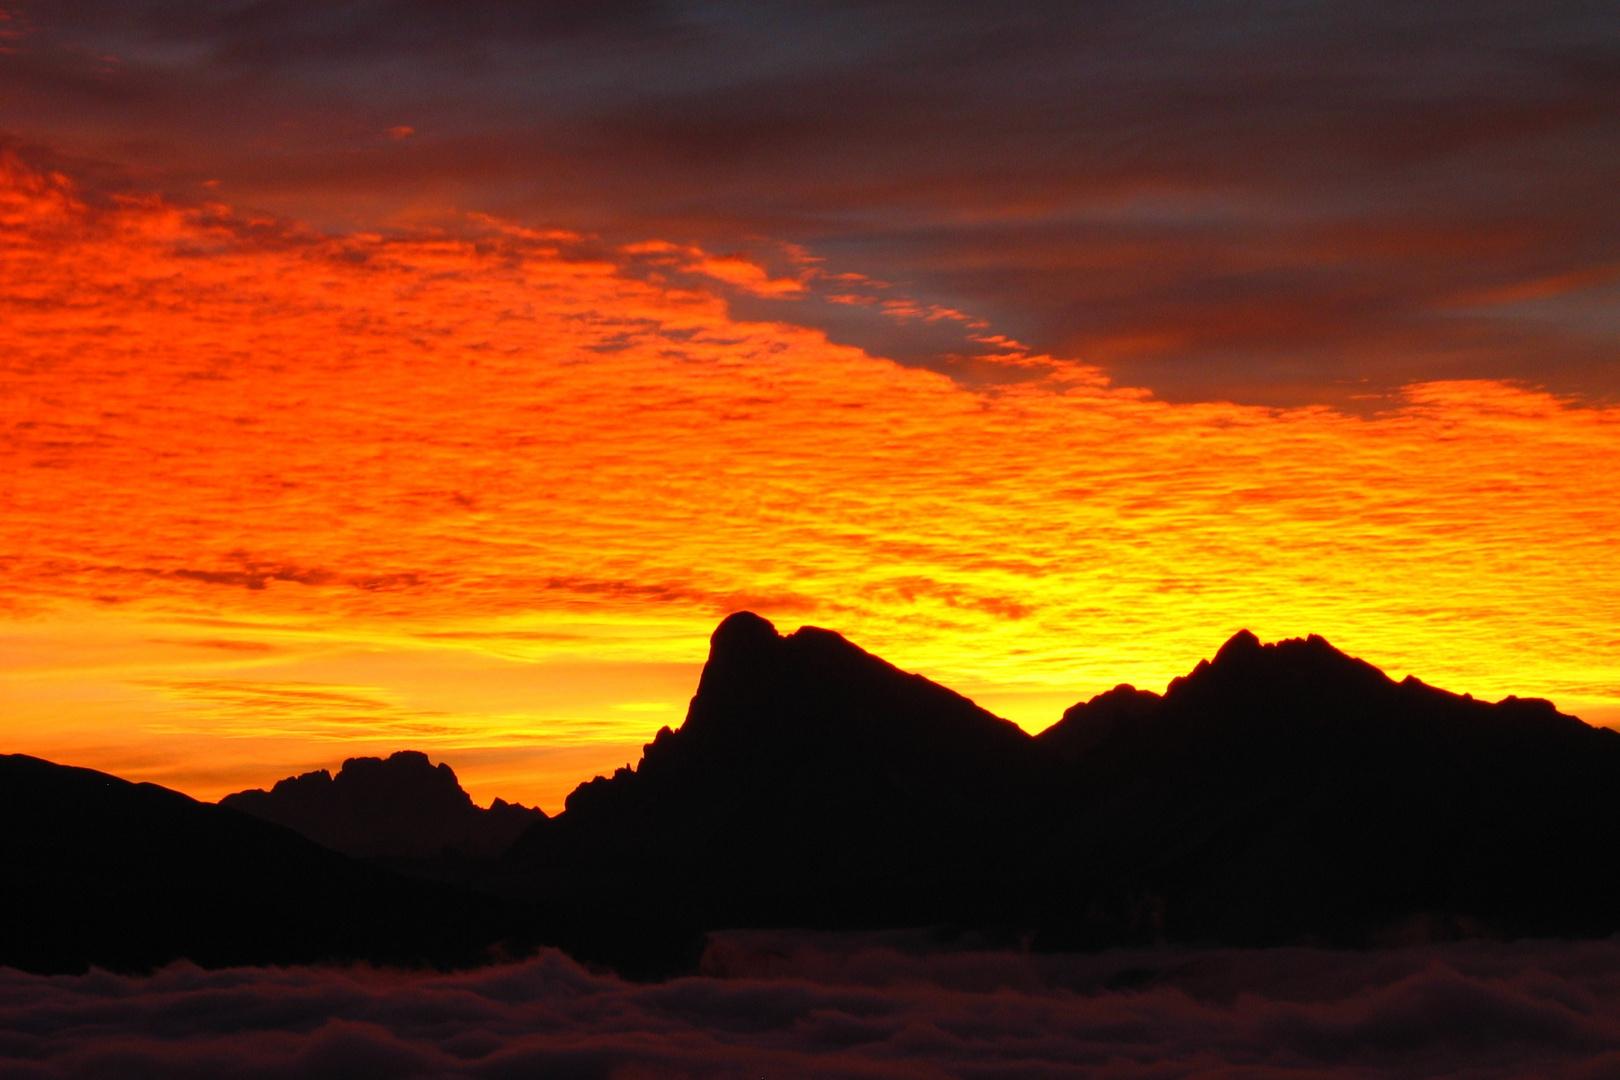 Sonnenaufgang um halb sechs